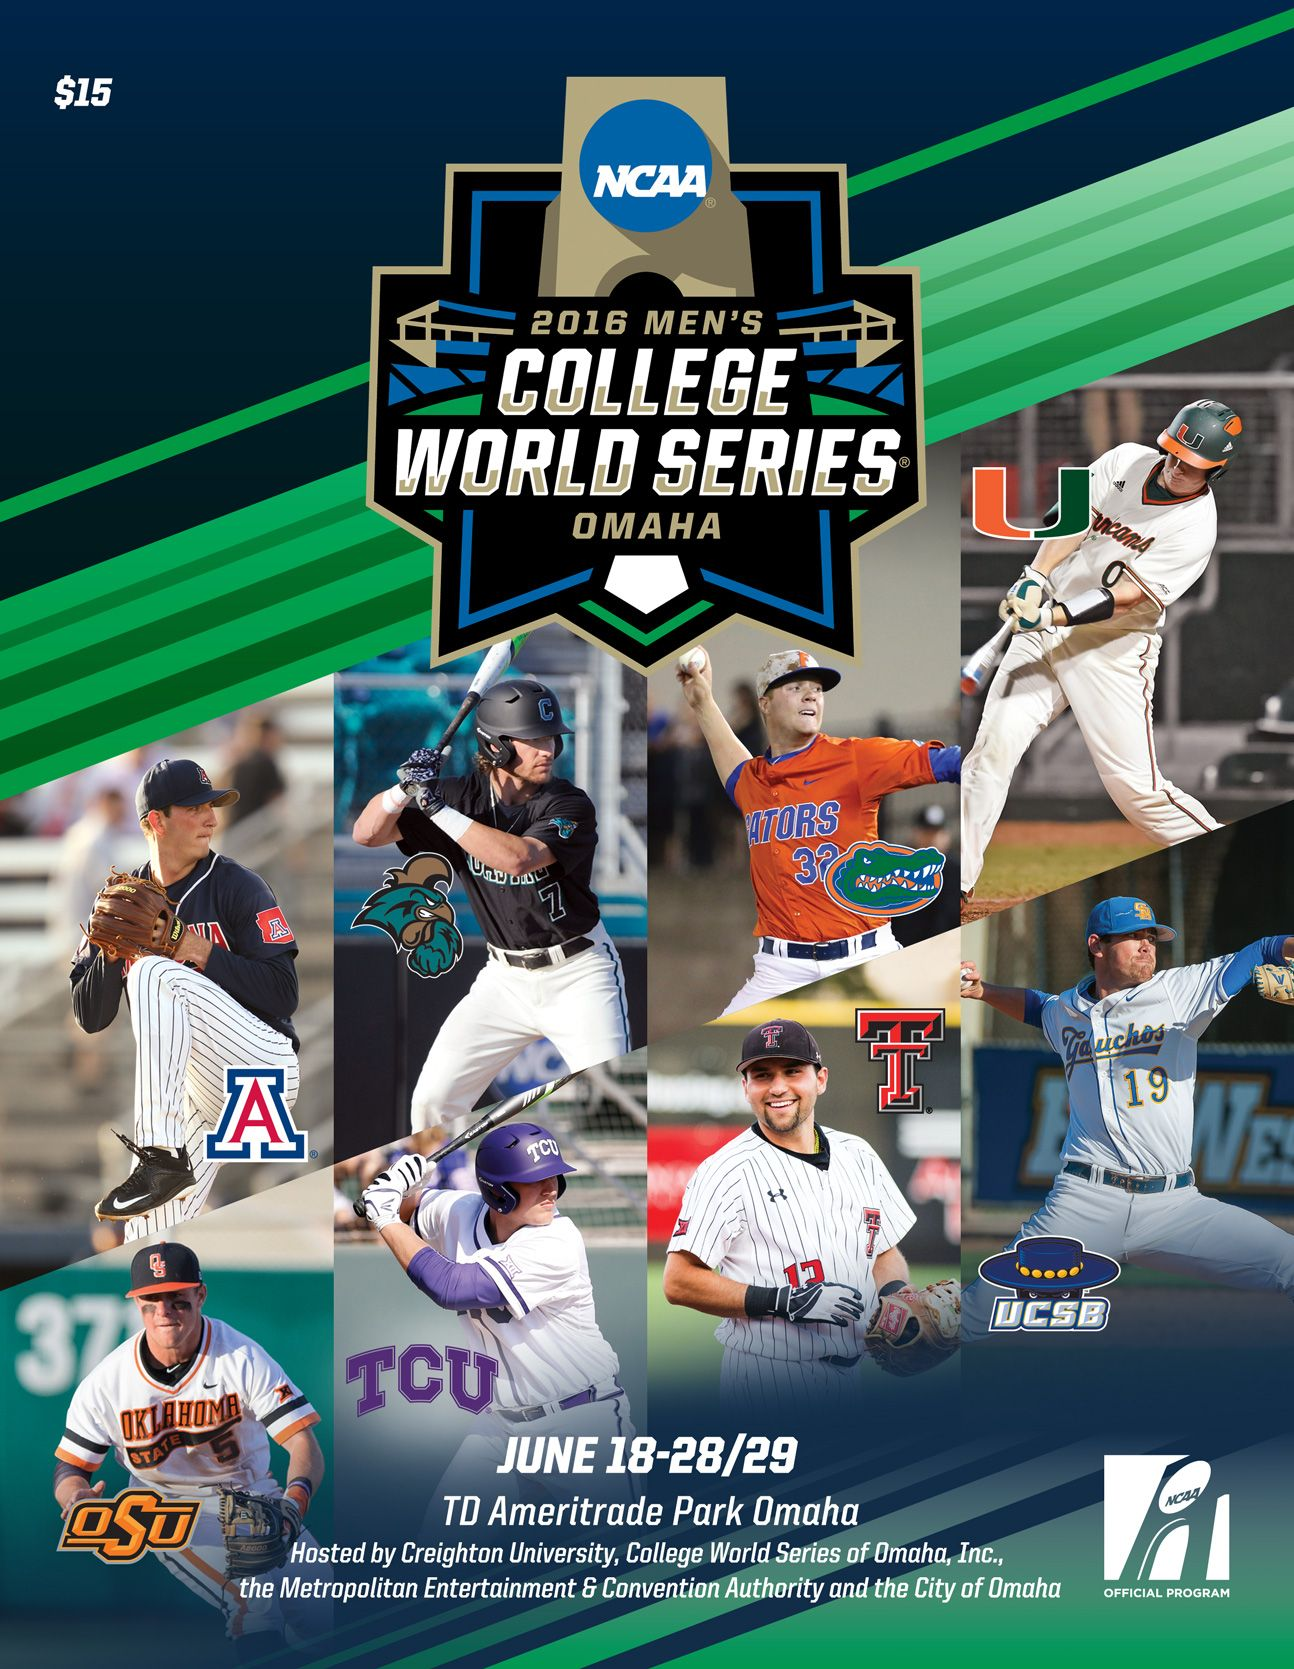 2016 Ncaa Division I Baseball Men S College World Series Program Featuring Nathan Bannister Of Ari College World Series Baseball World Series Coastal Carolina